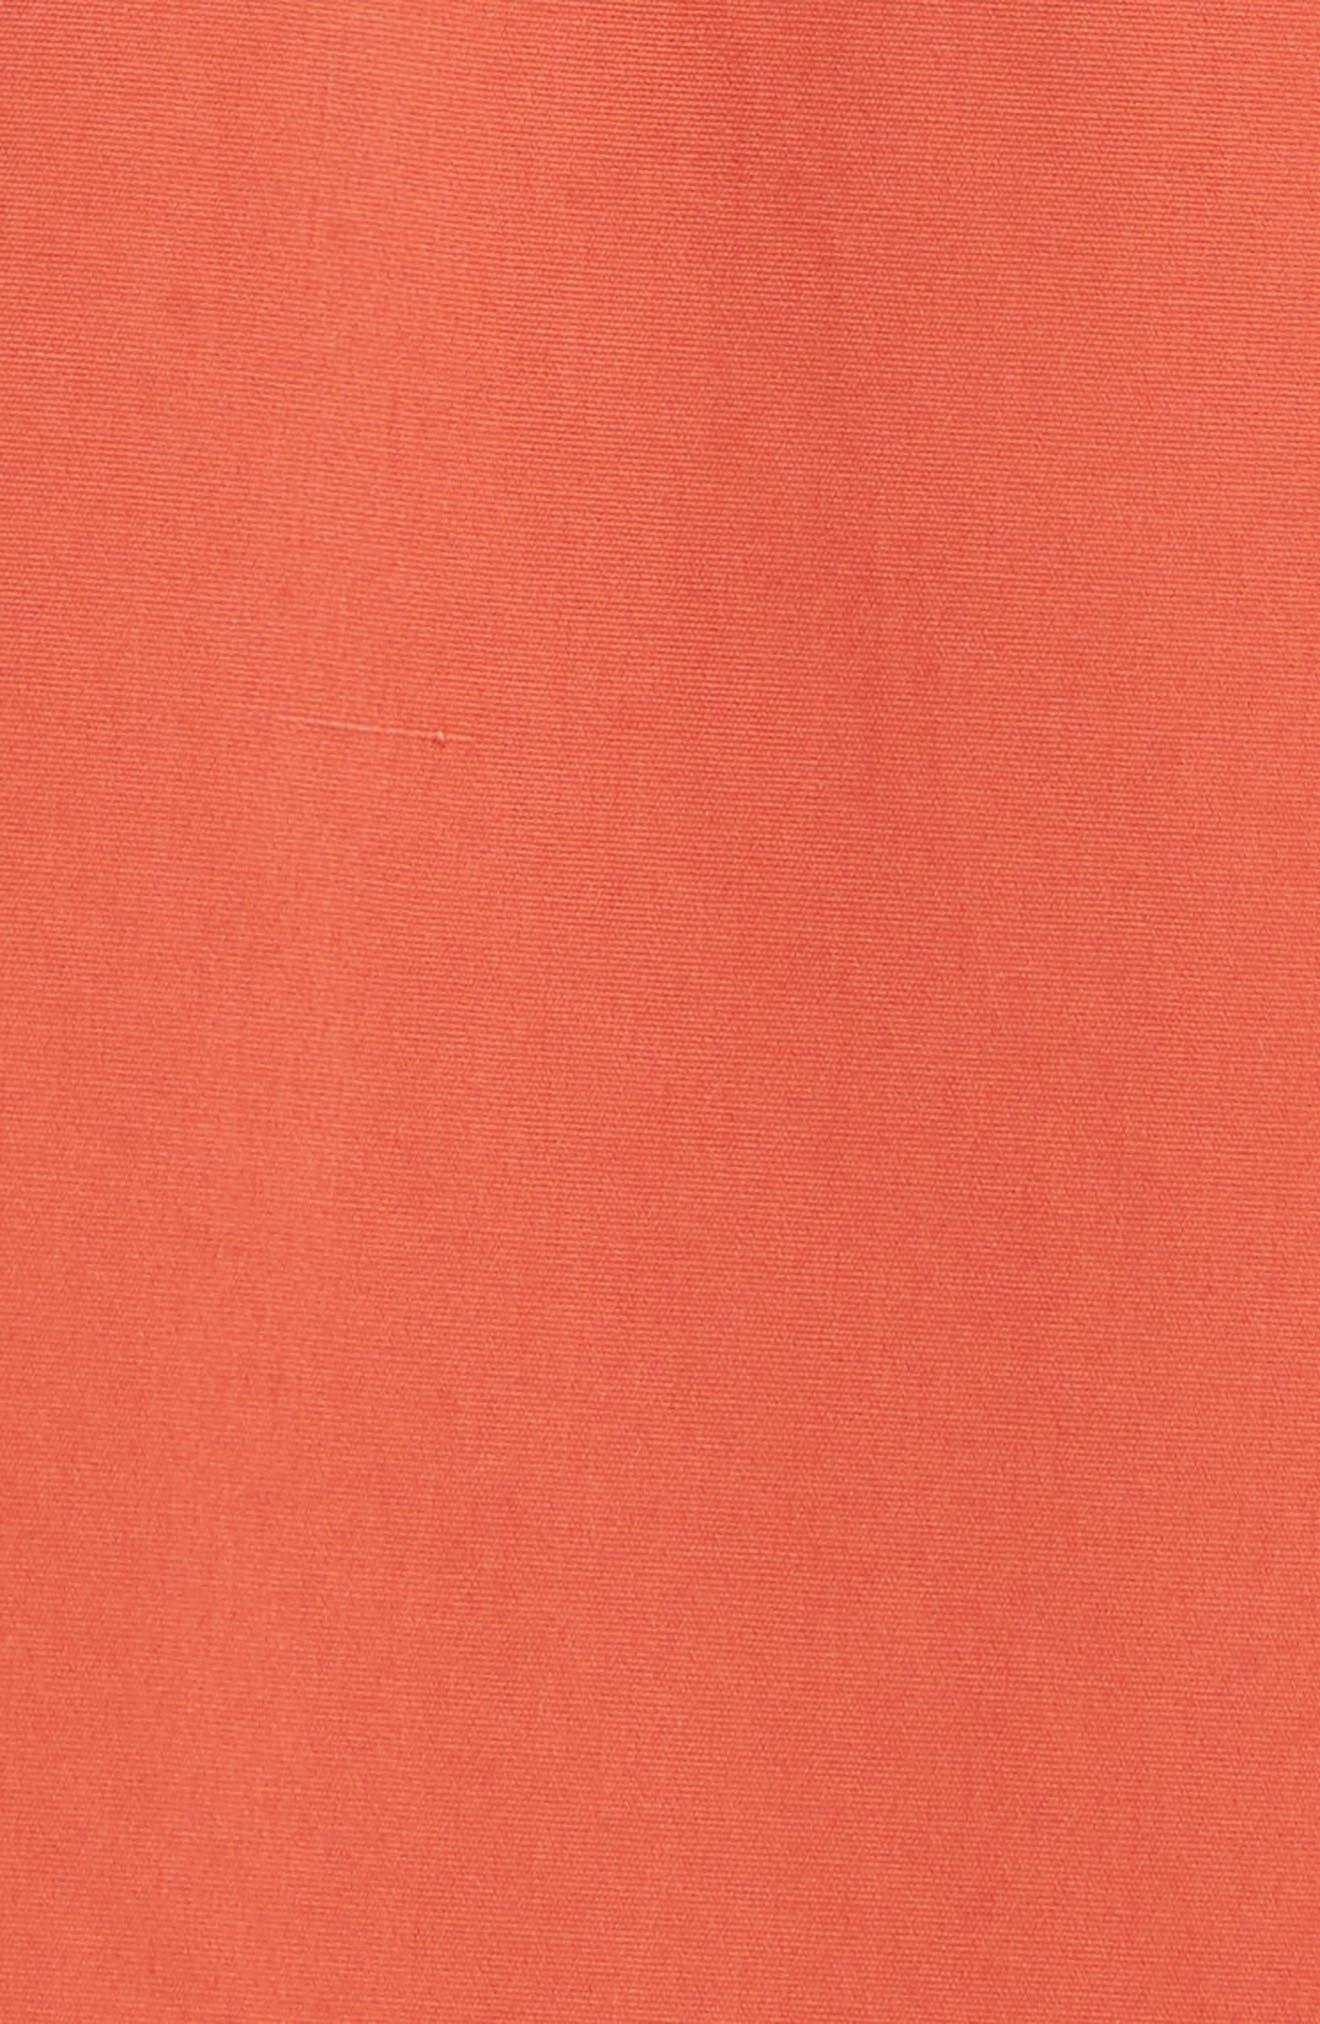 Cotton Poplin Shirtdress,                             Alternate thumbnail 5, color,                             Rust